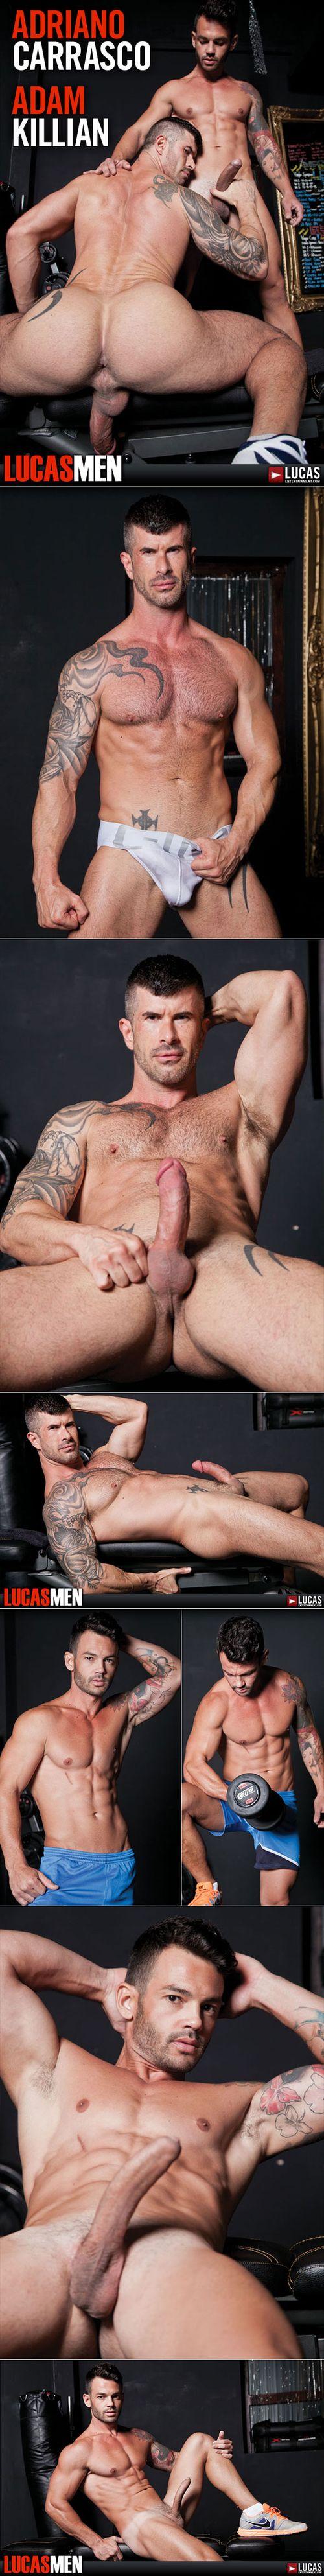 Adriano-Carrasco-Adam-Killian-LucasEnt-1